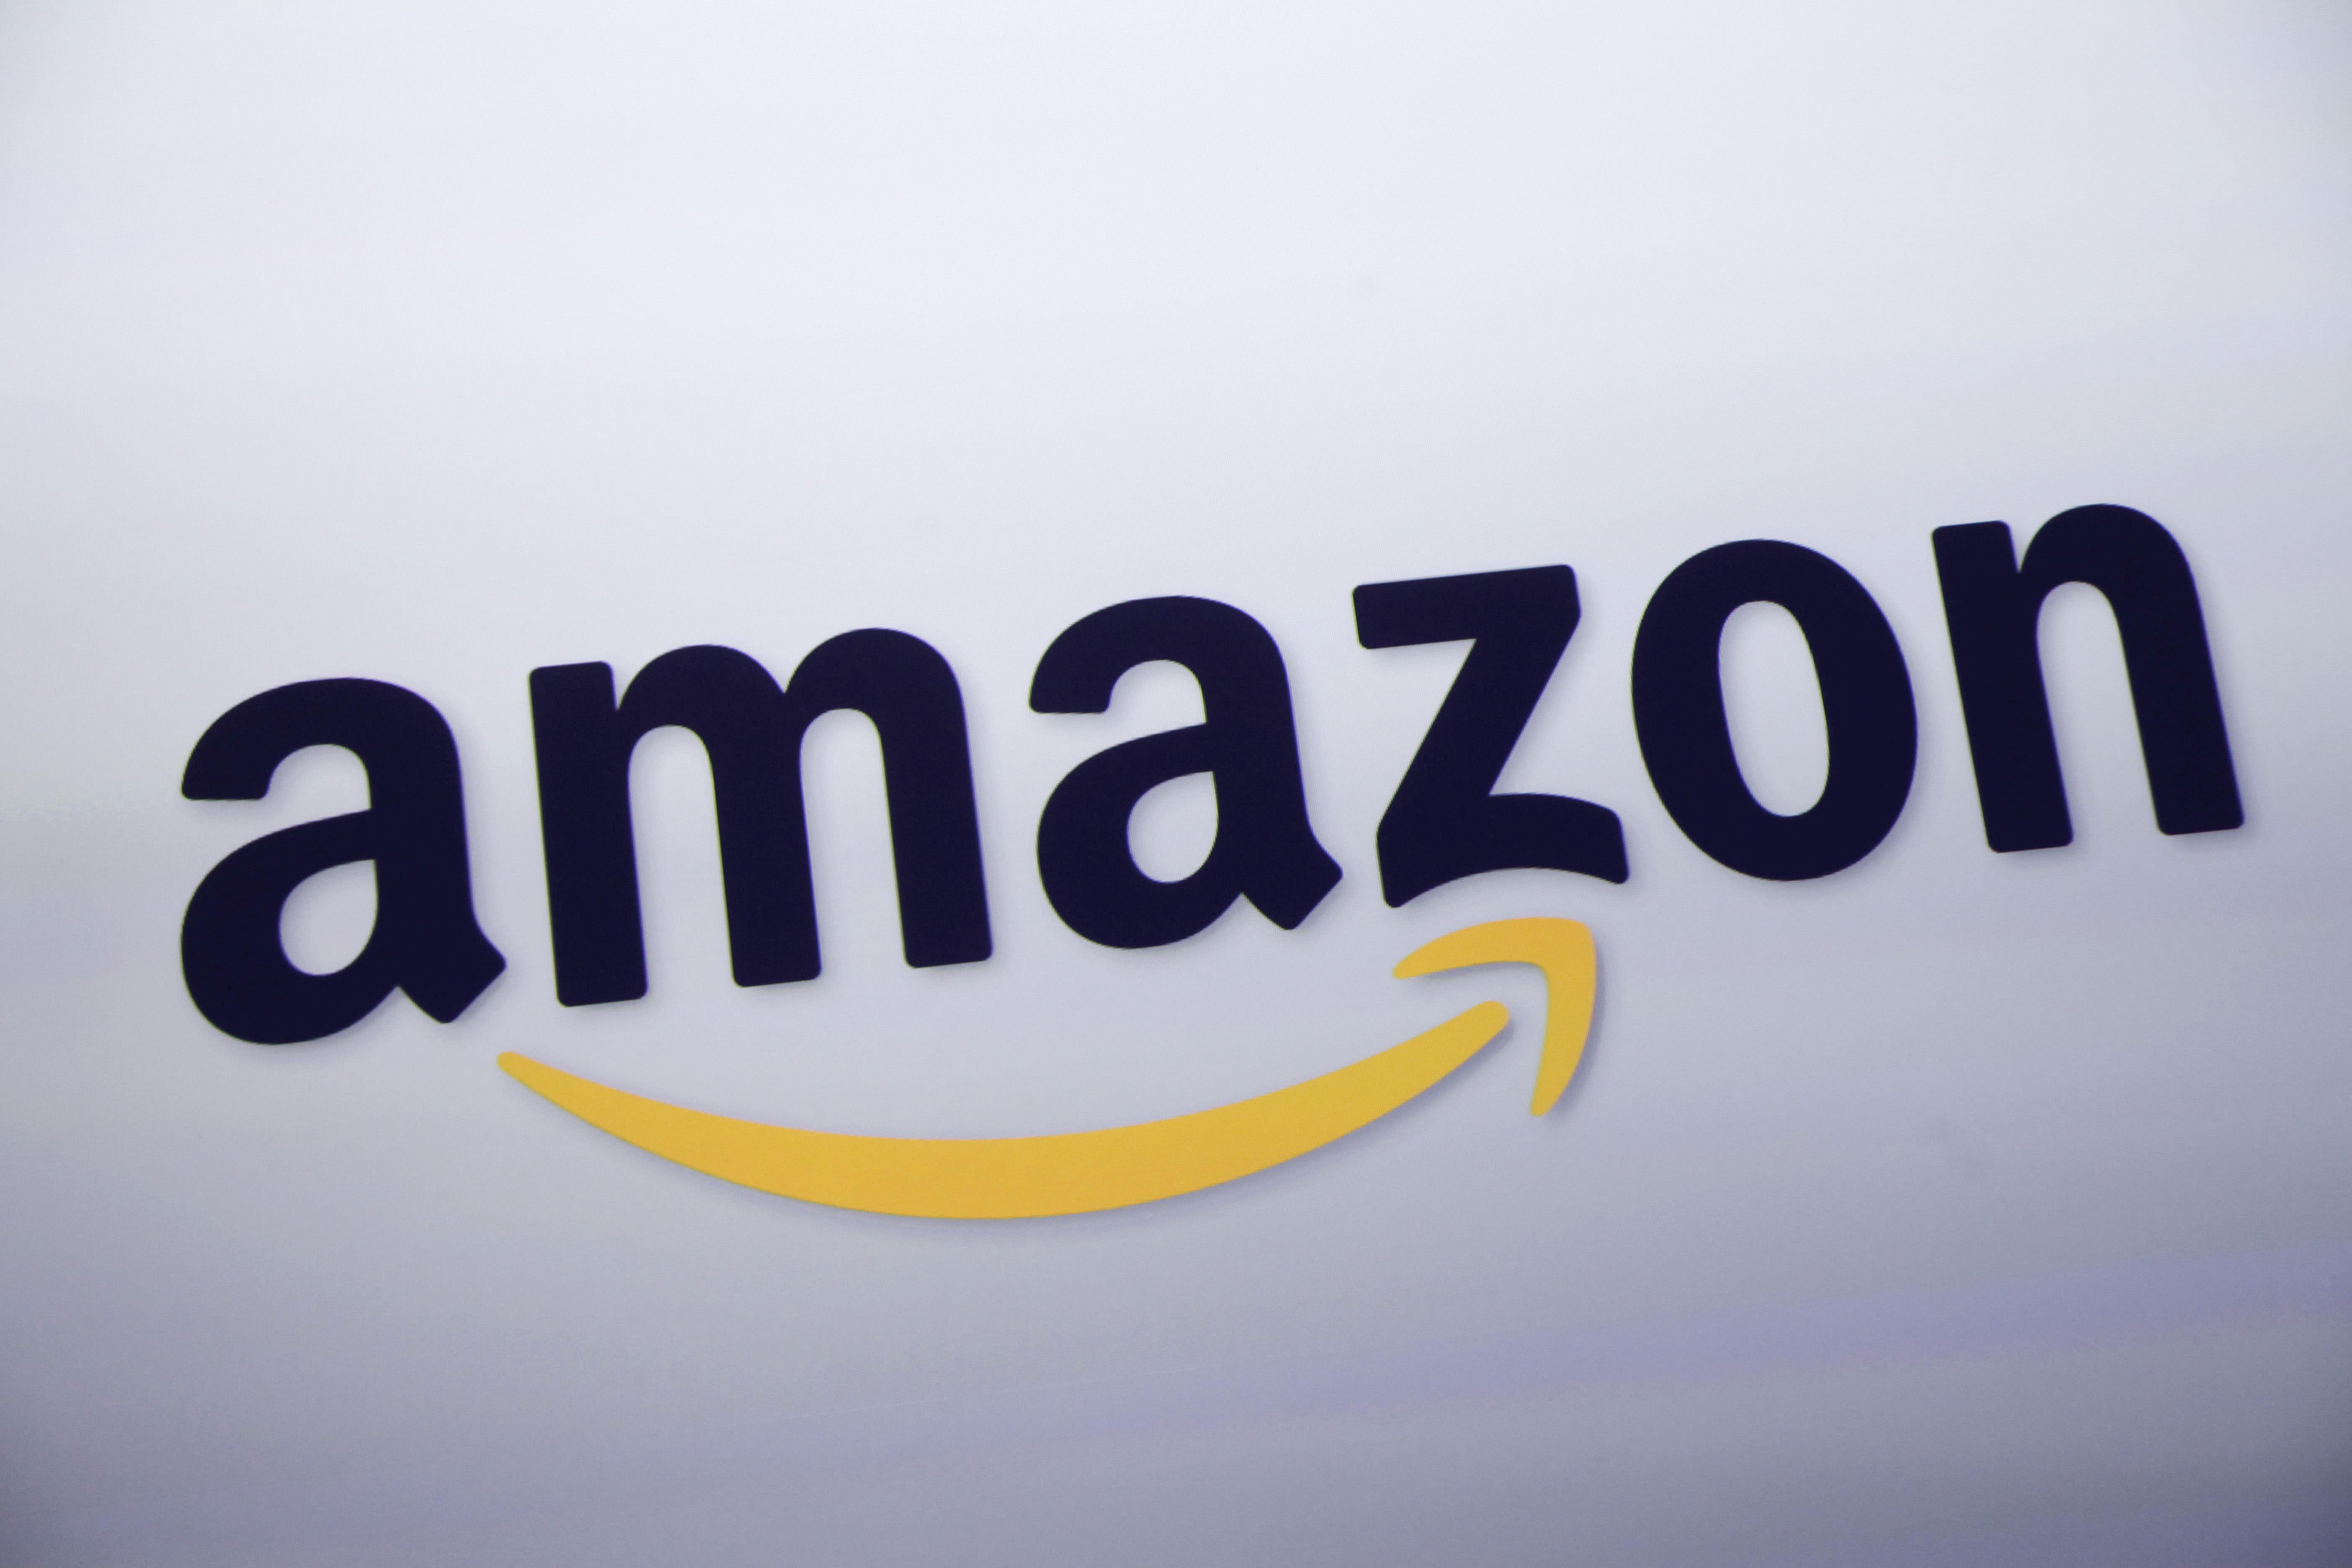 Amazon's amazing quarter, ExxonMobil near 52-week high